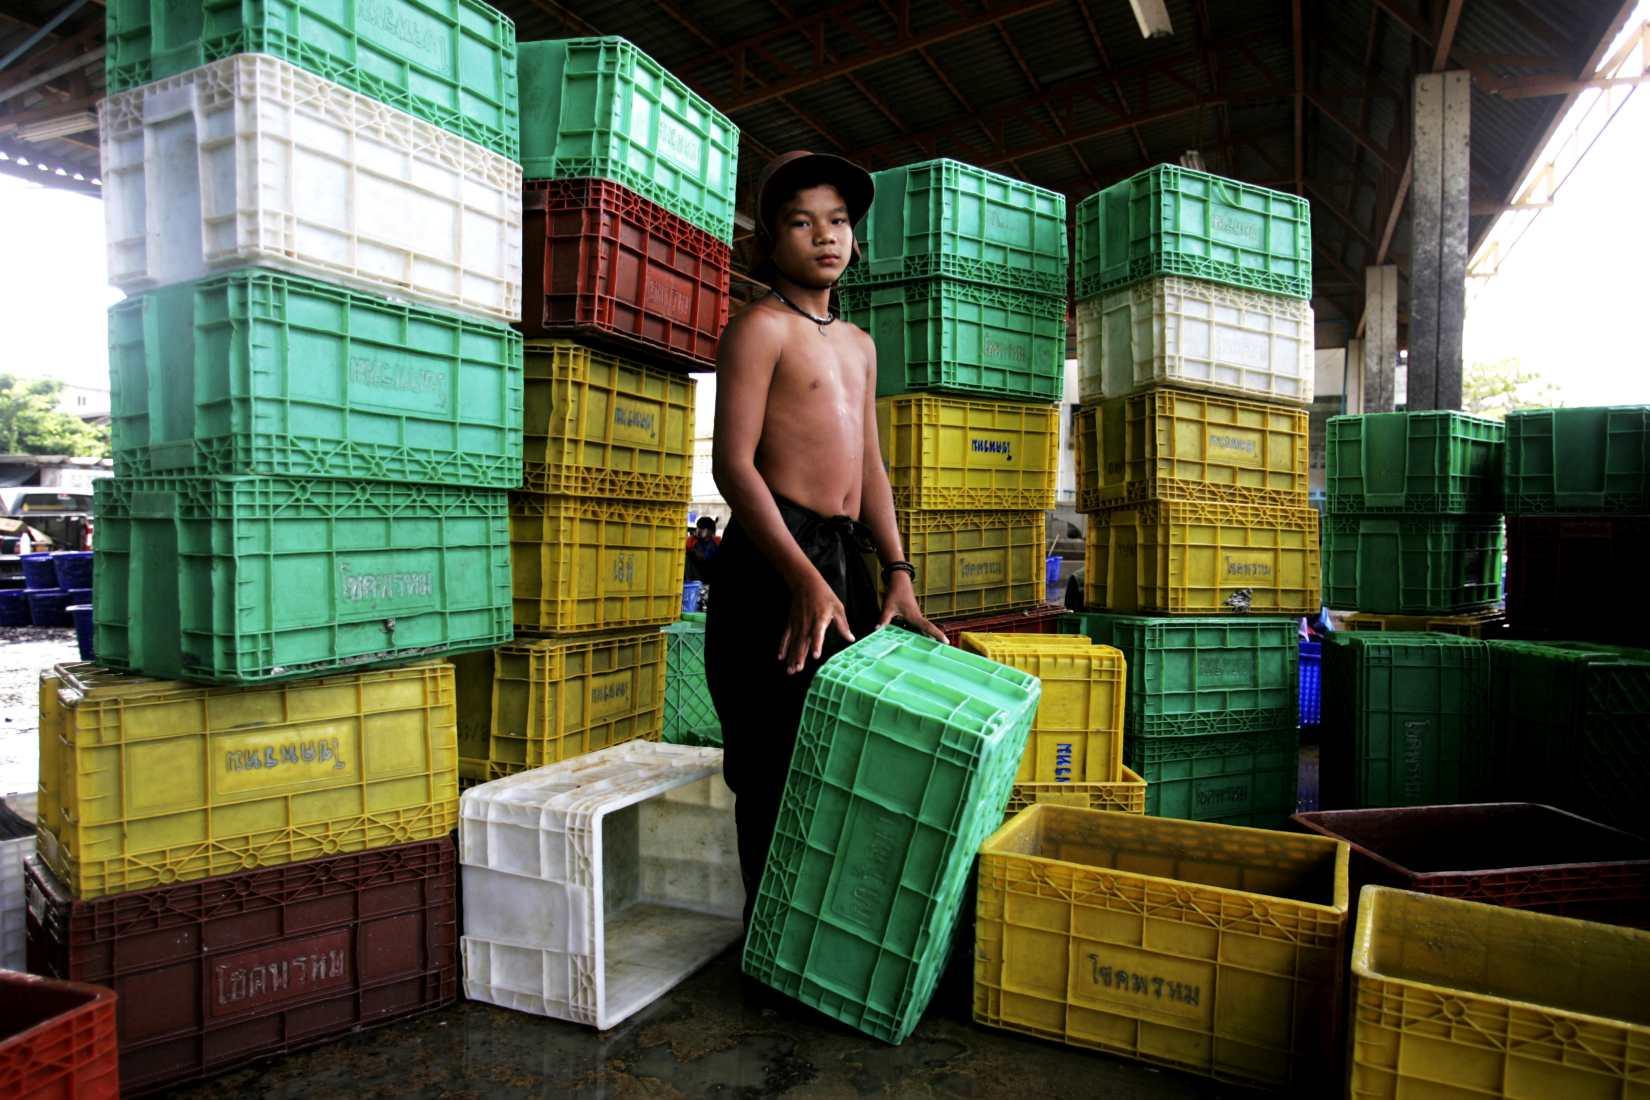 """Child laborer"" Samut Sakorn fishing docks, Thailand. 2009"